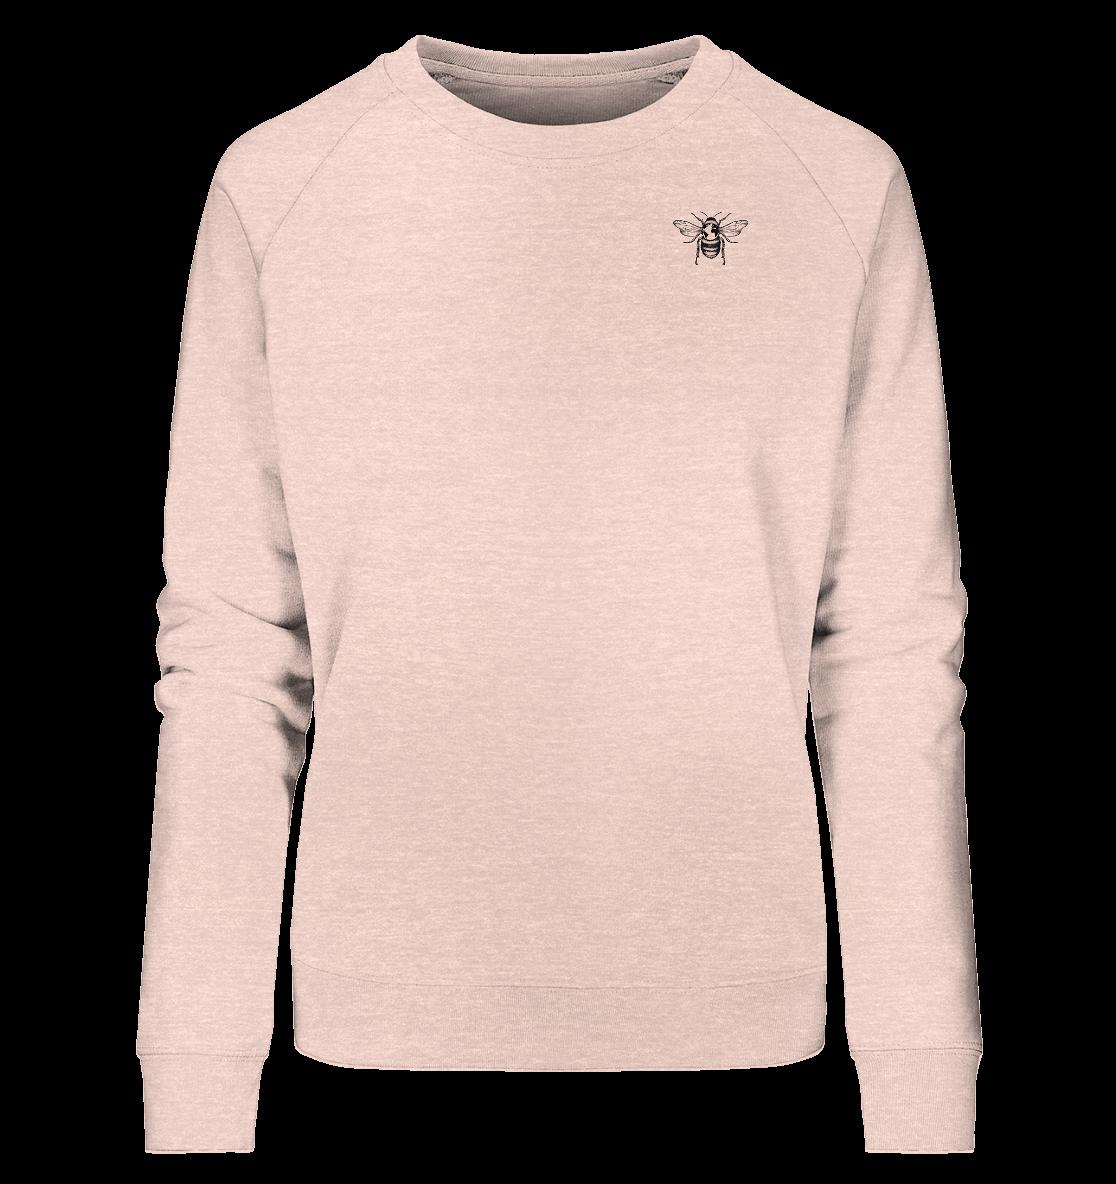 front-ladies-organic-sweatshirt-ffded6-1116x.png